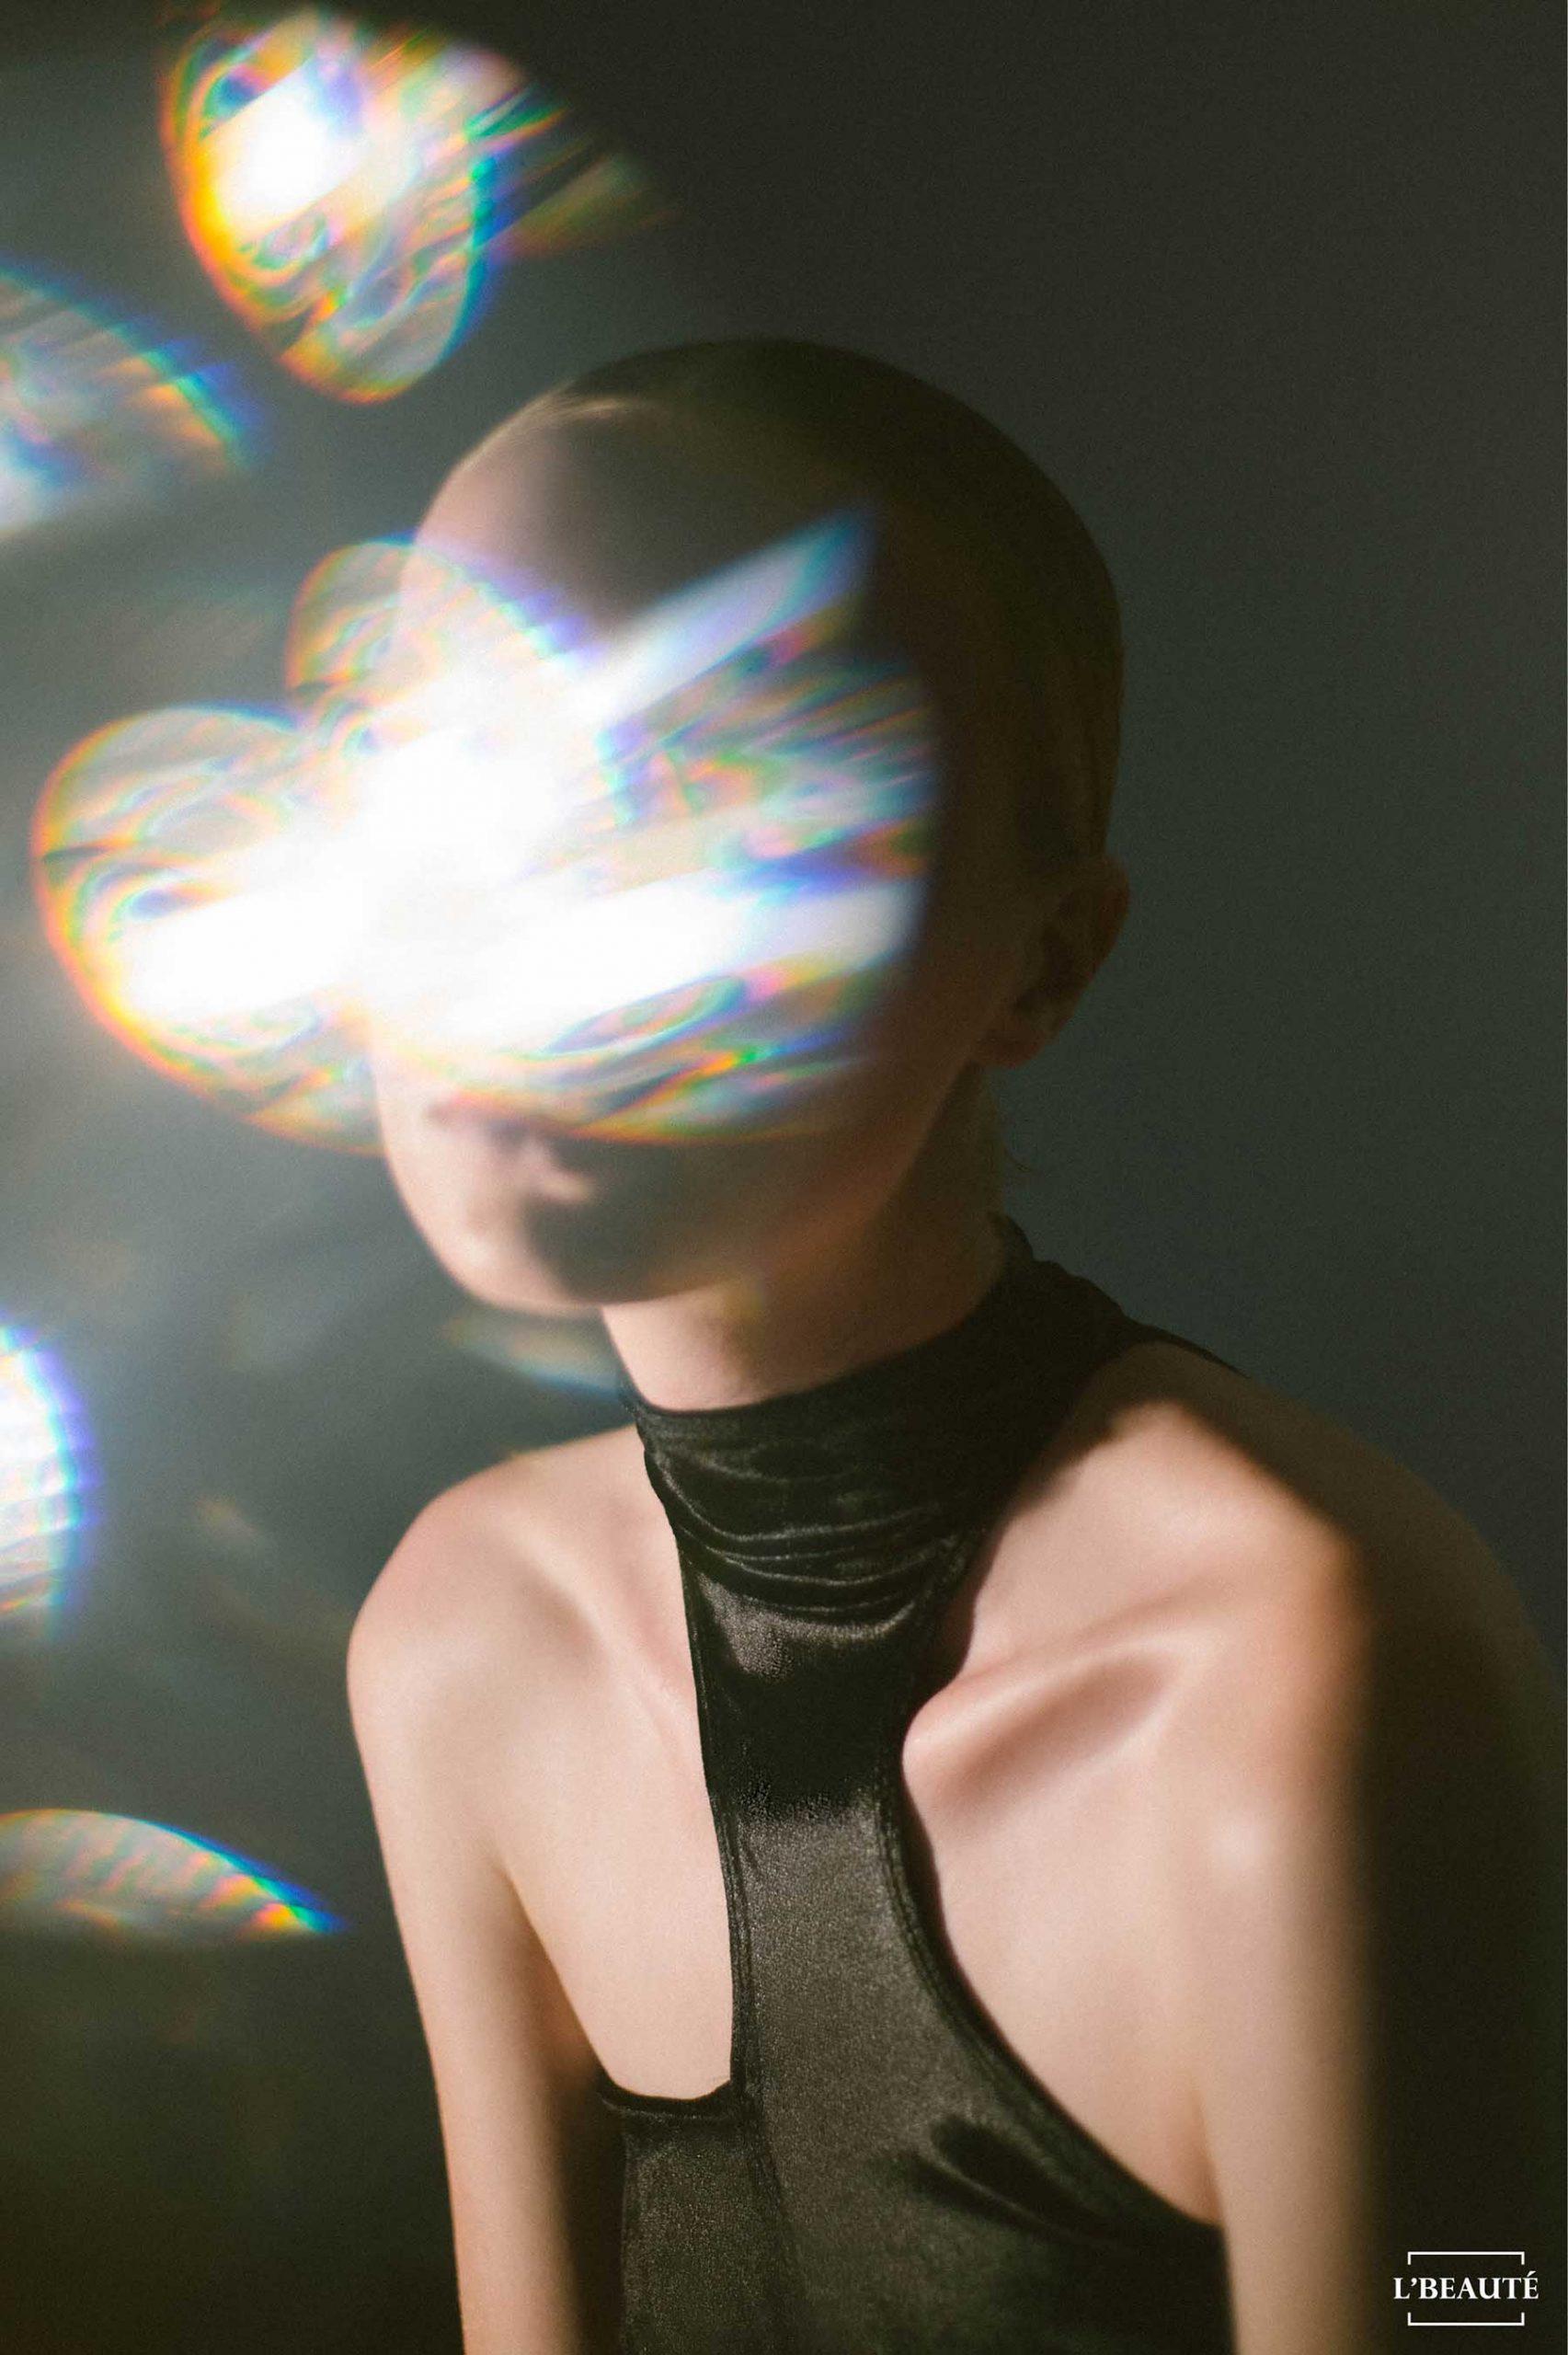 Beauty-Givenchy-Nicolas-Degennes9